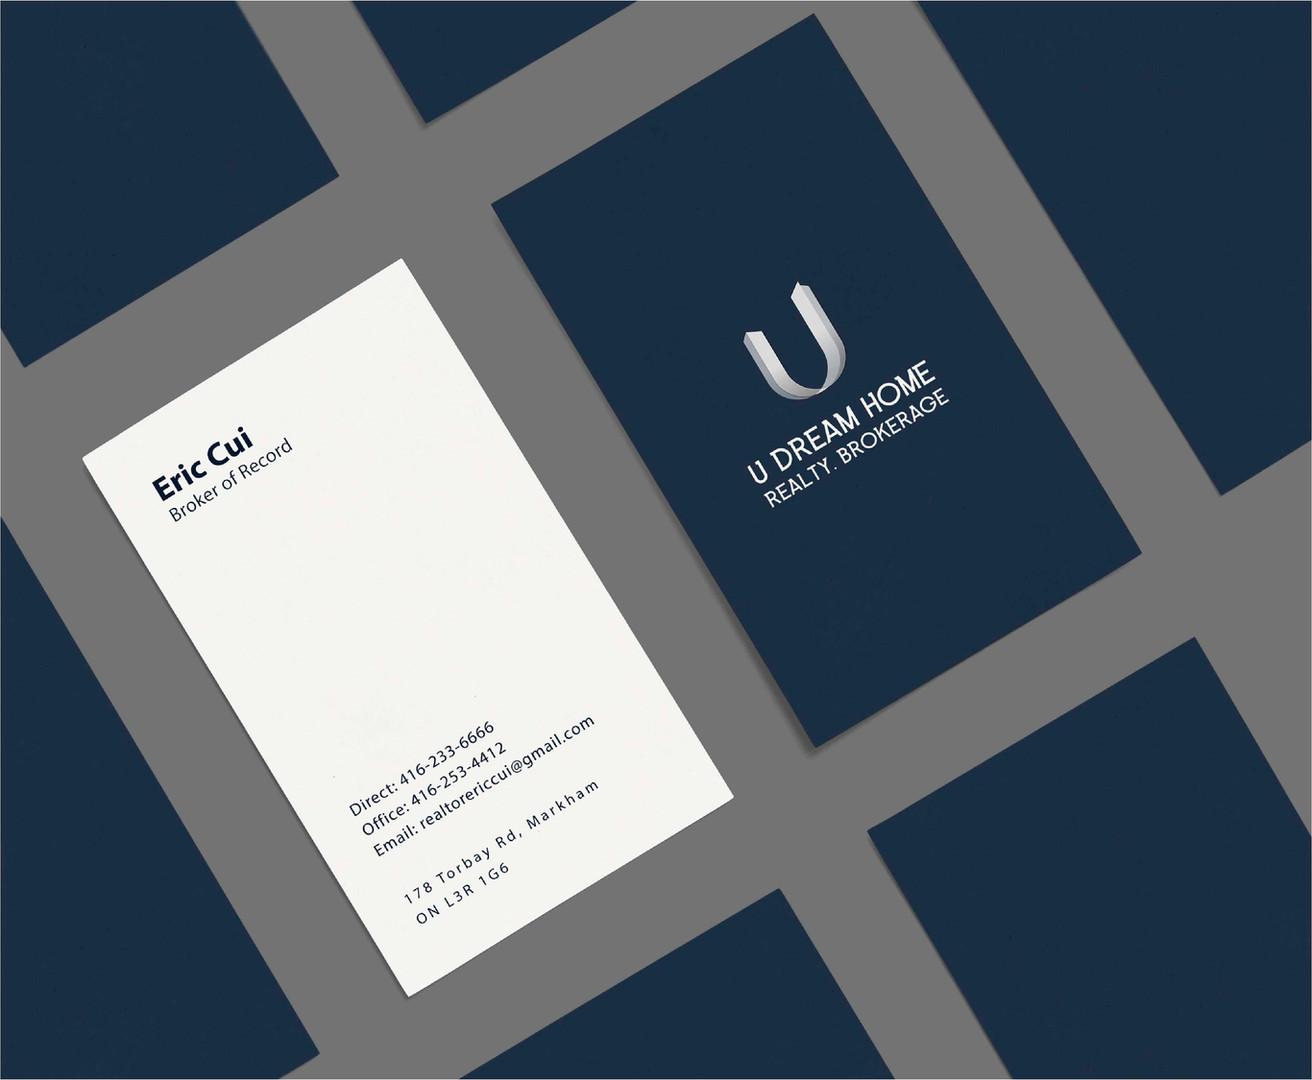 u dream home-02.jpg